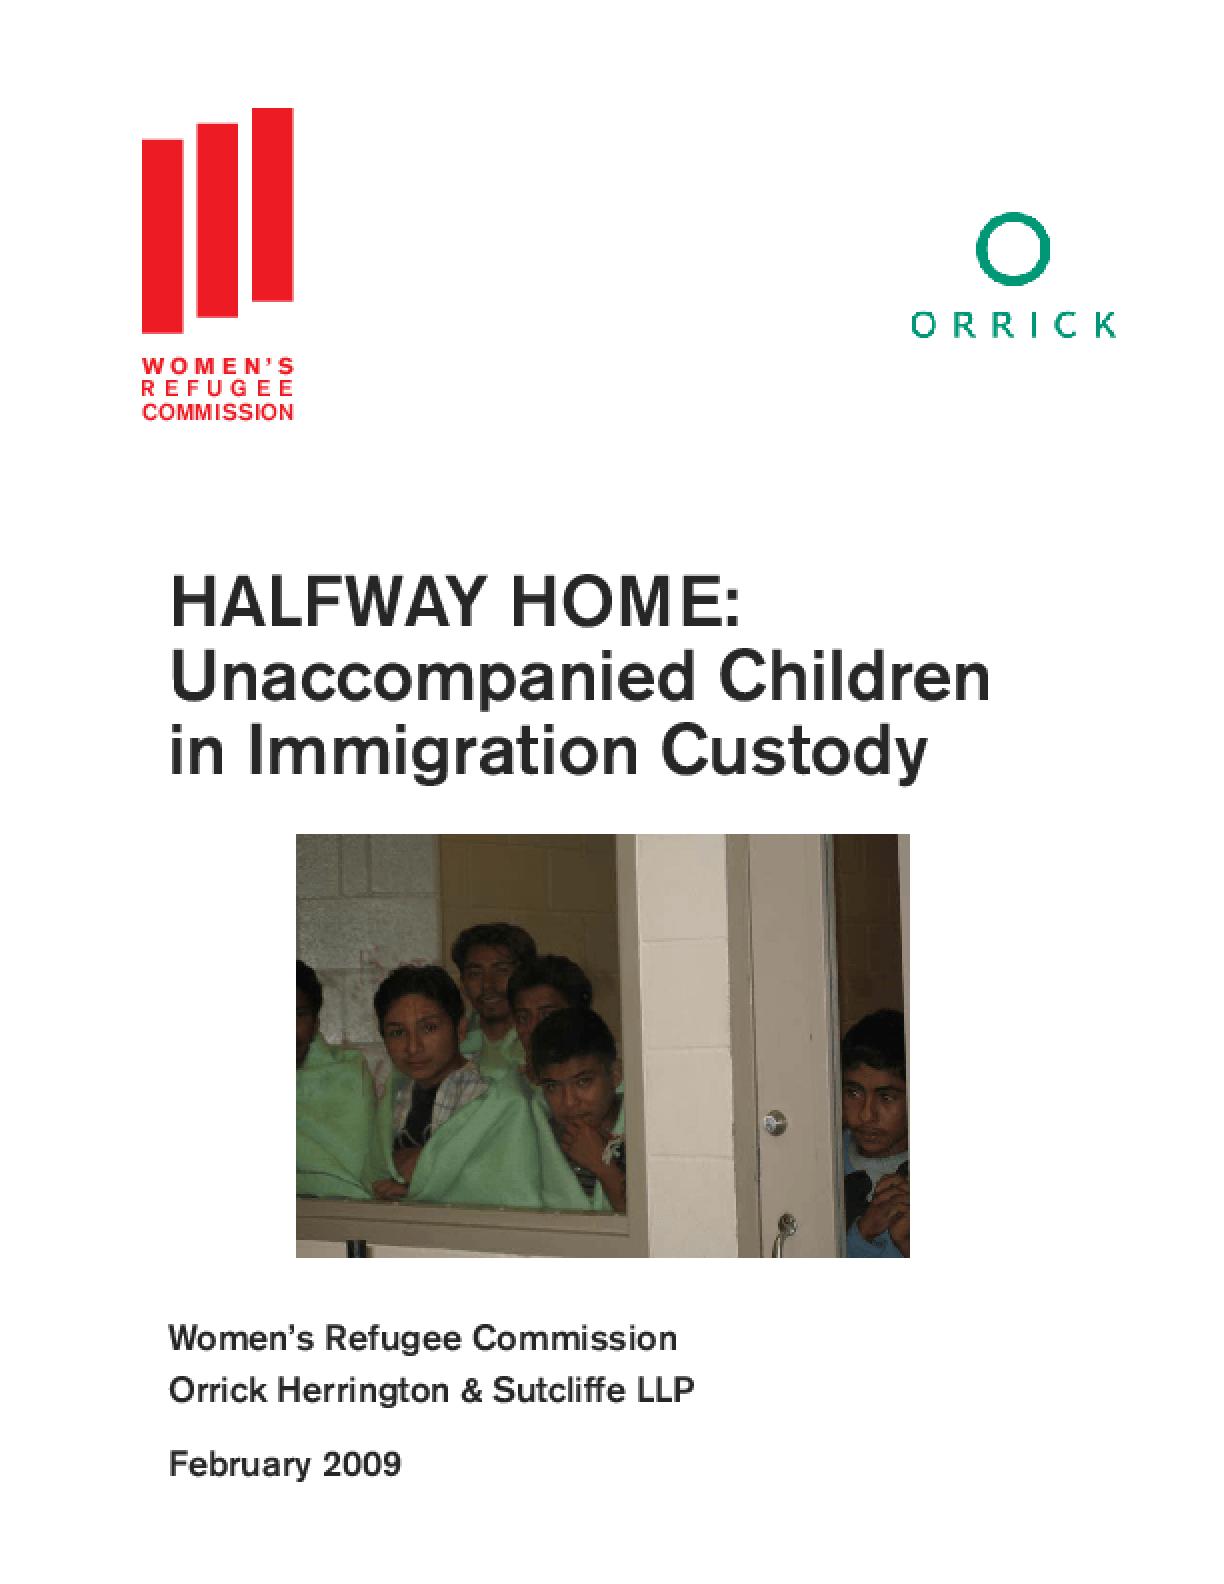 Halfway Home: Unaccompanied Children in Immigration Custody